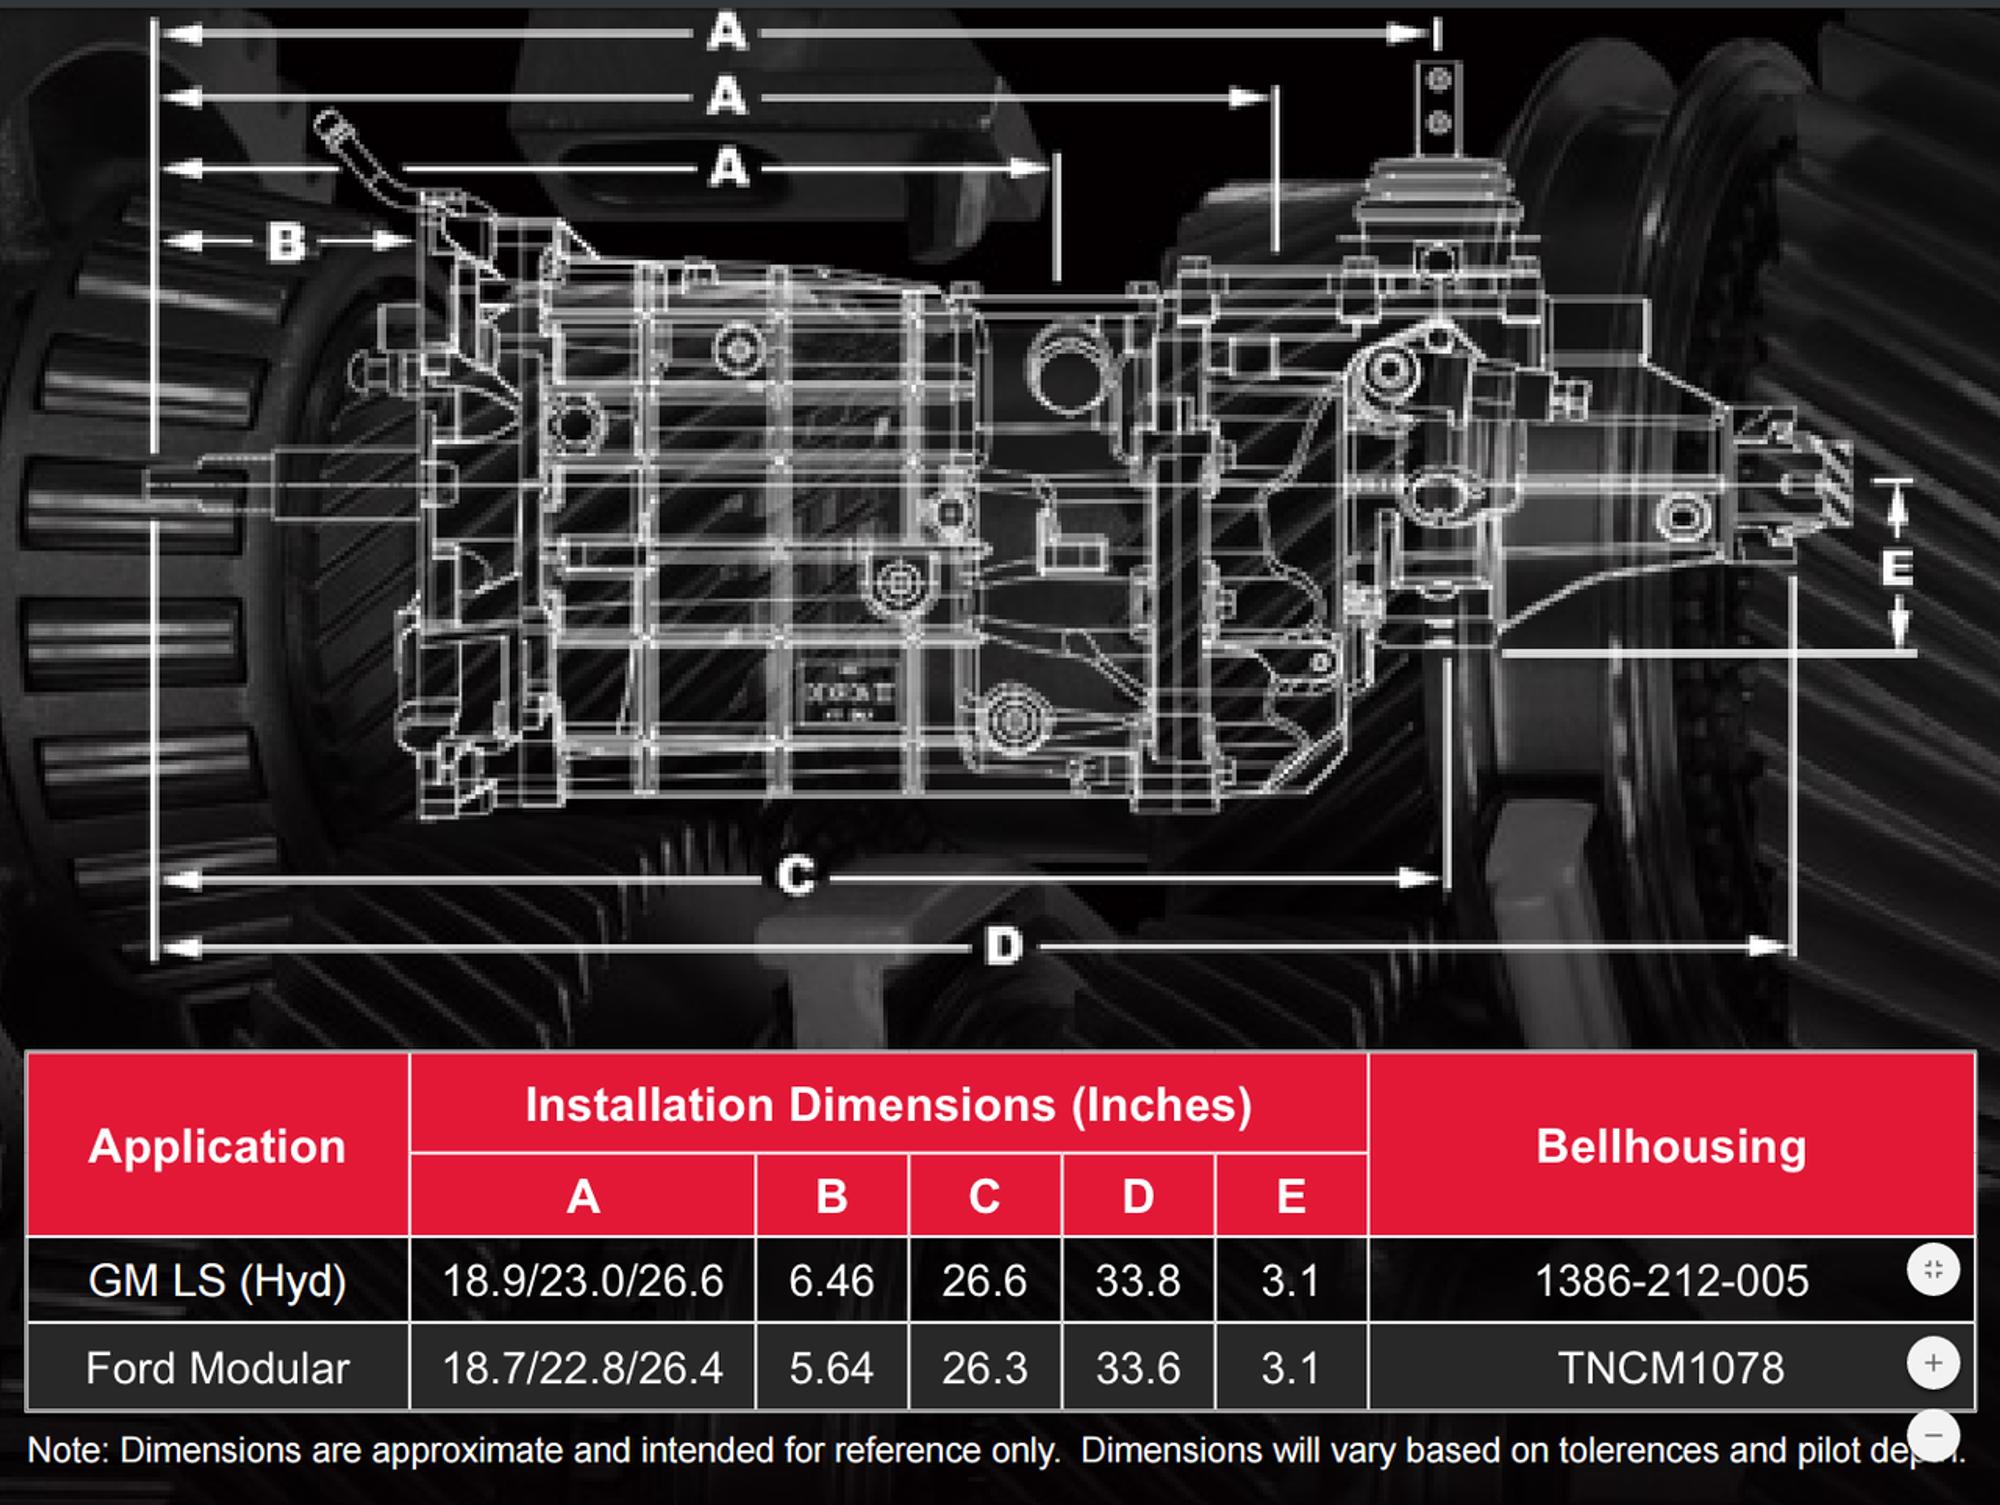 tremec t56 magnum manual transmission 6 speed 1 1 8\